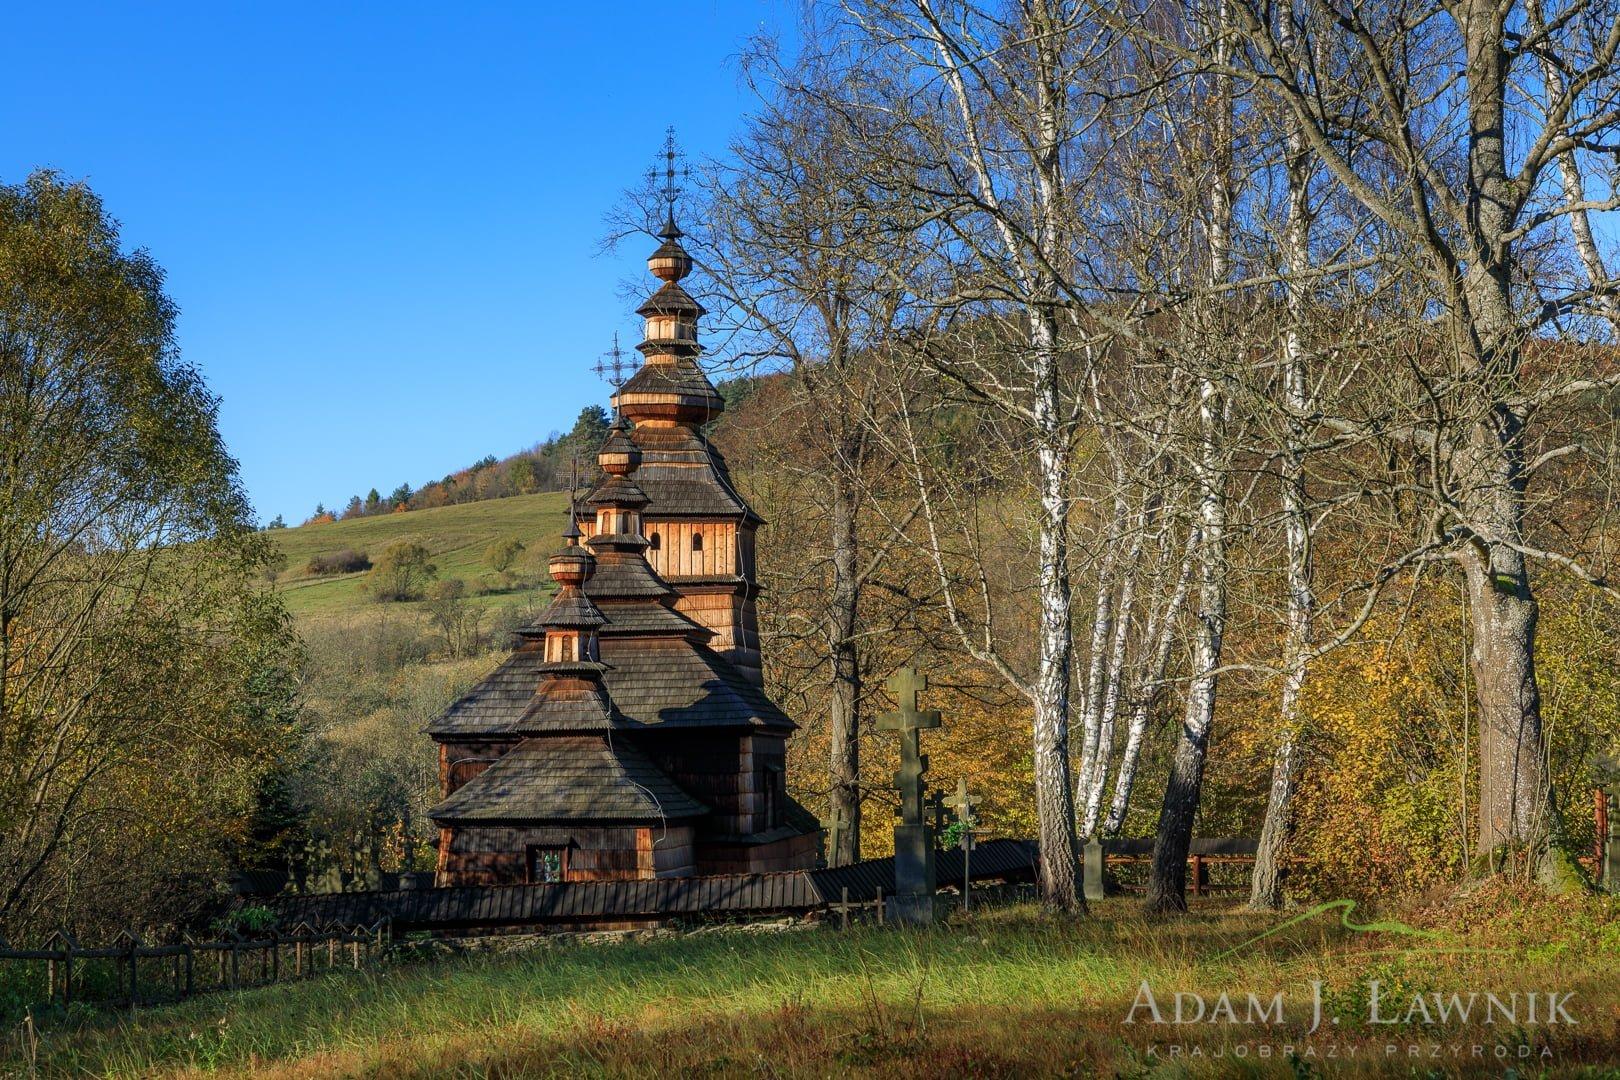 Low Beskids, Poland 1810-00500C